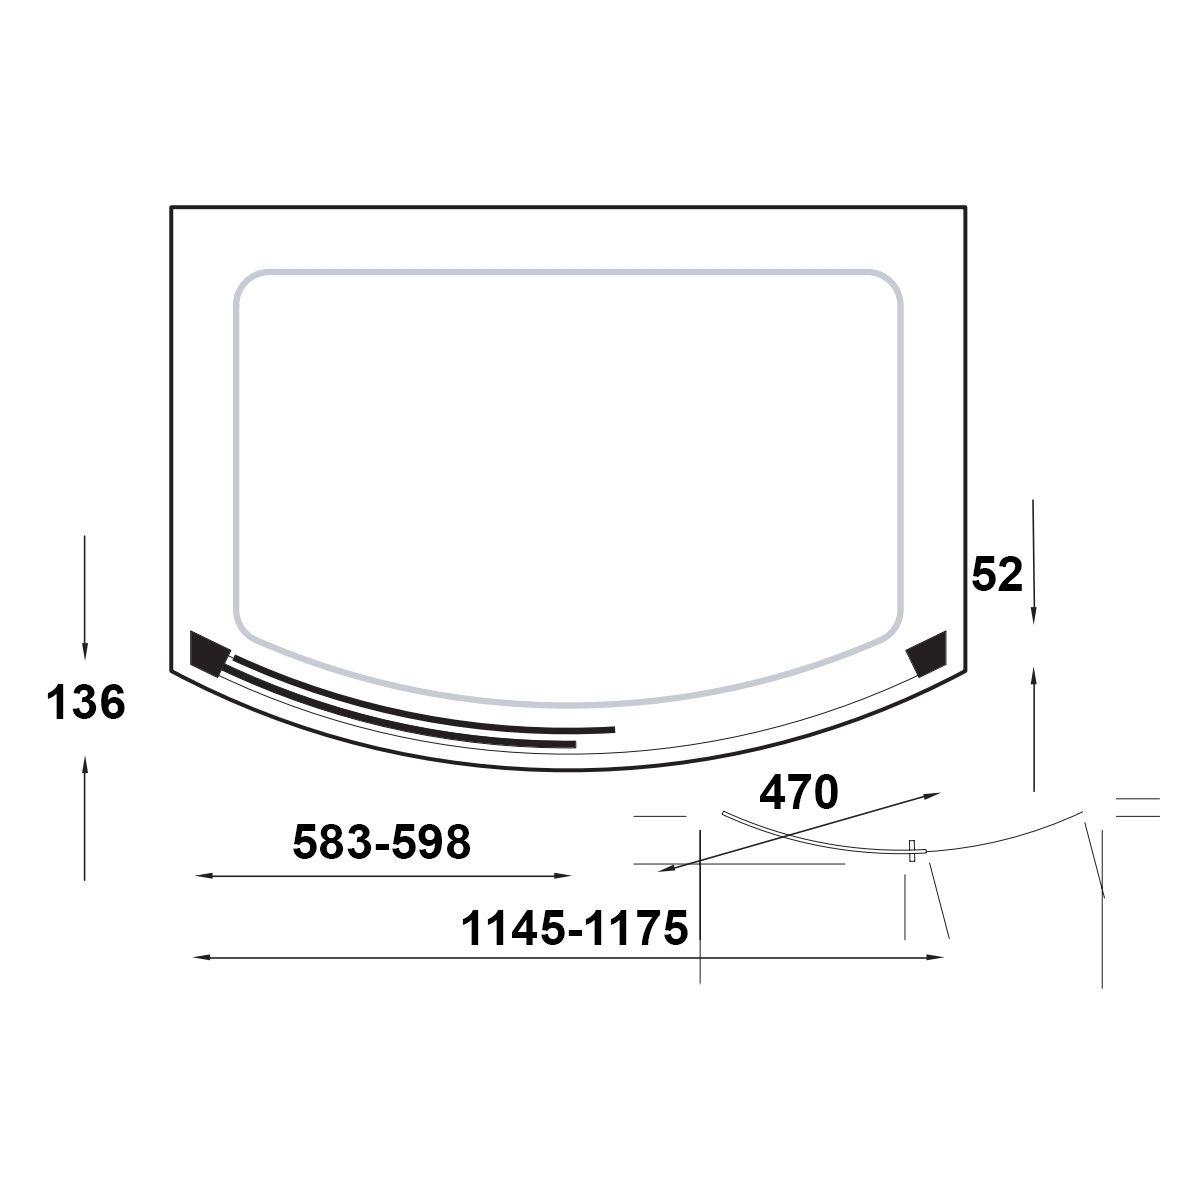 kudosoriginalbowedslidingshowerenclosure1200withconcept2showertraydimensions